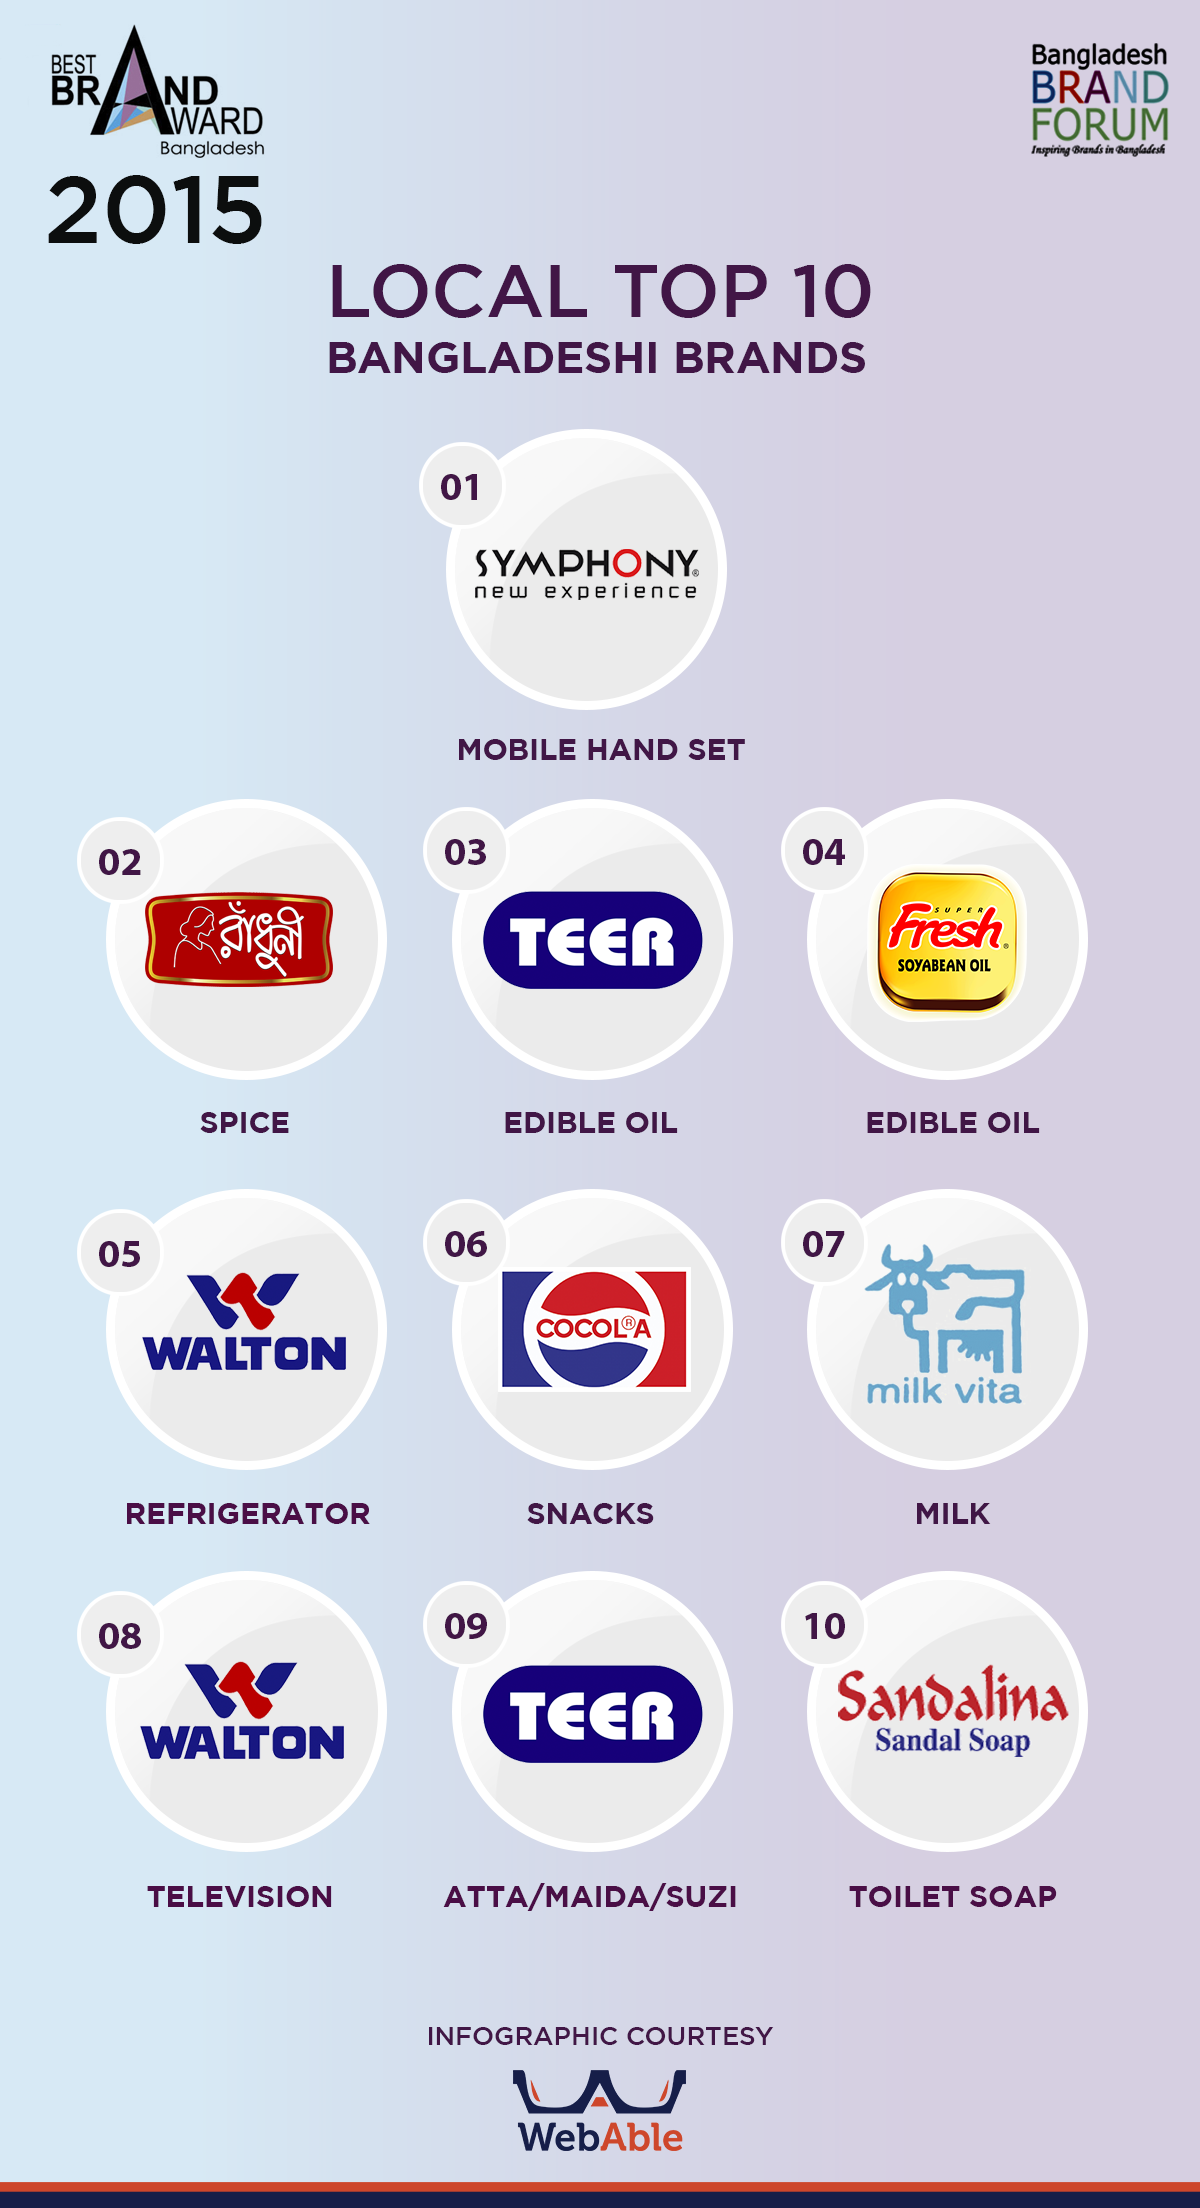 Top 10 Bangladeshi Brands - 2015 [Infographic] - Webable Digital - Best Brand Award - Bangladesh Brand Forum